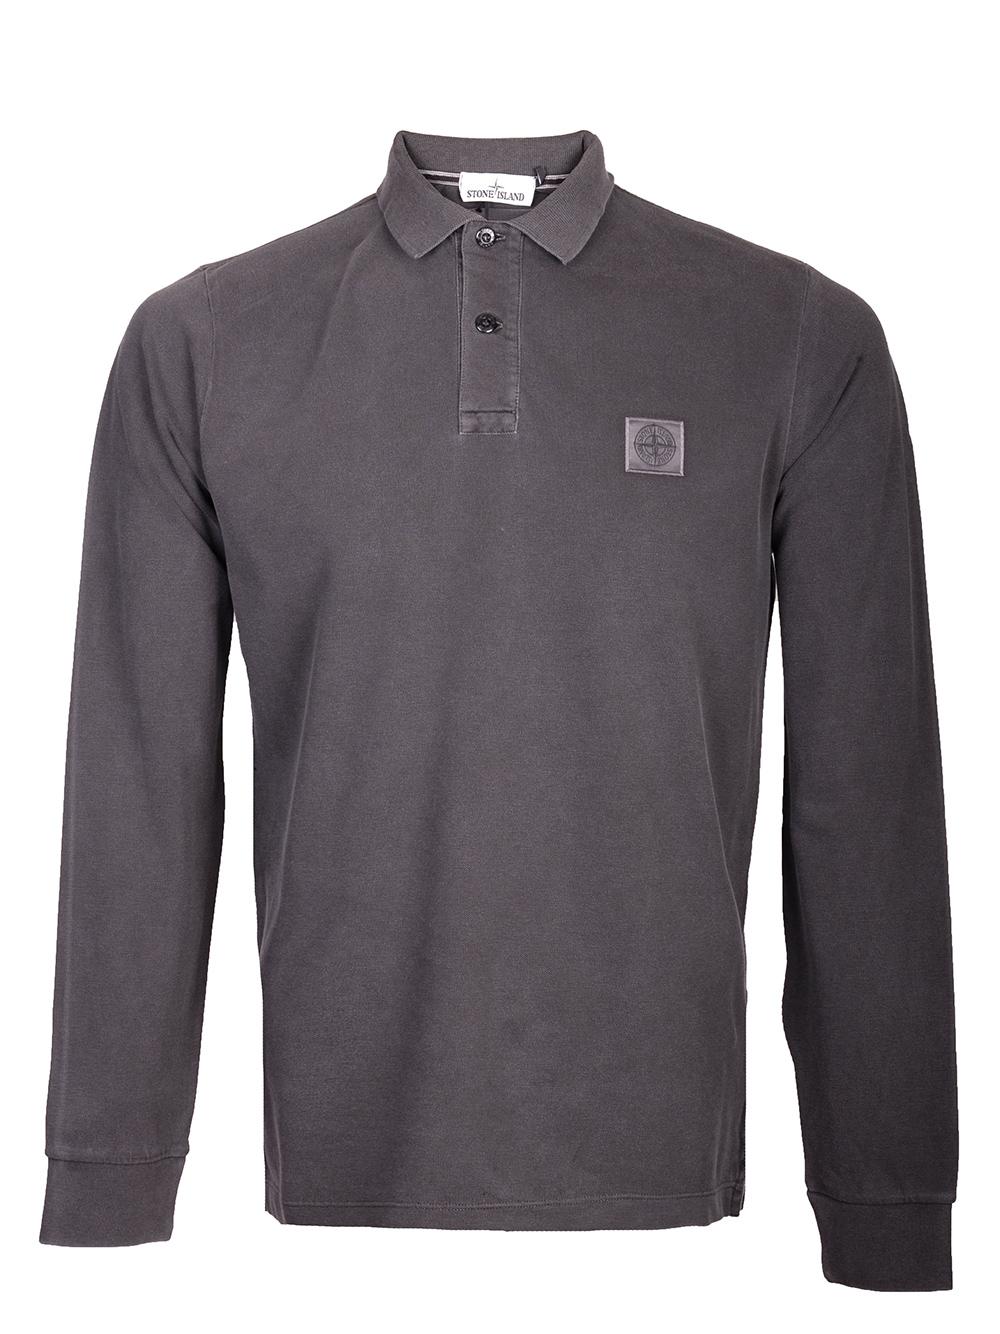 STONE ISLAND Μπλούζα Polo 71152SS67 ΧΑΚΙ